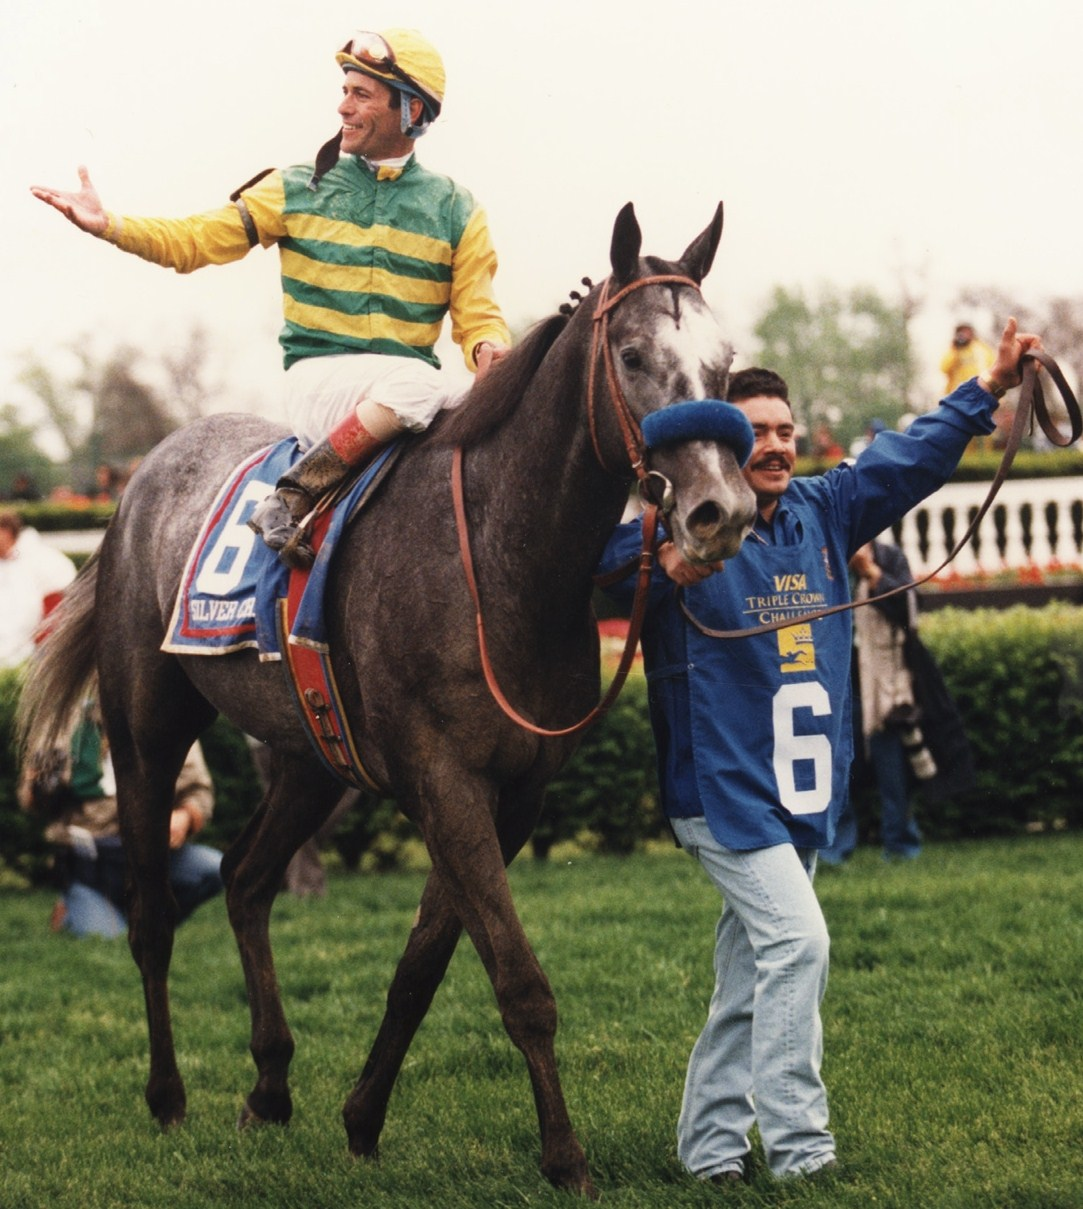 Silver Charm (Gary Stevens up) after winning the 1997 Kentucky Derby (Barbara D. Livingston)